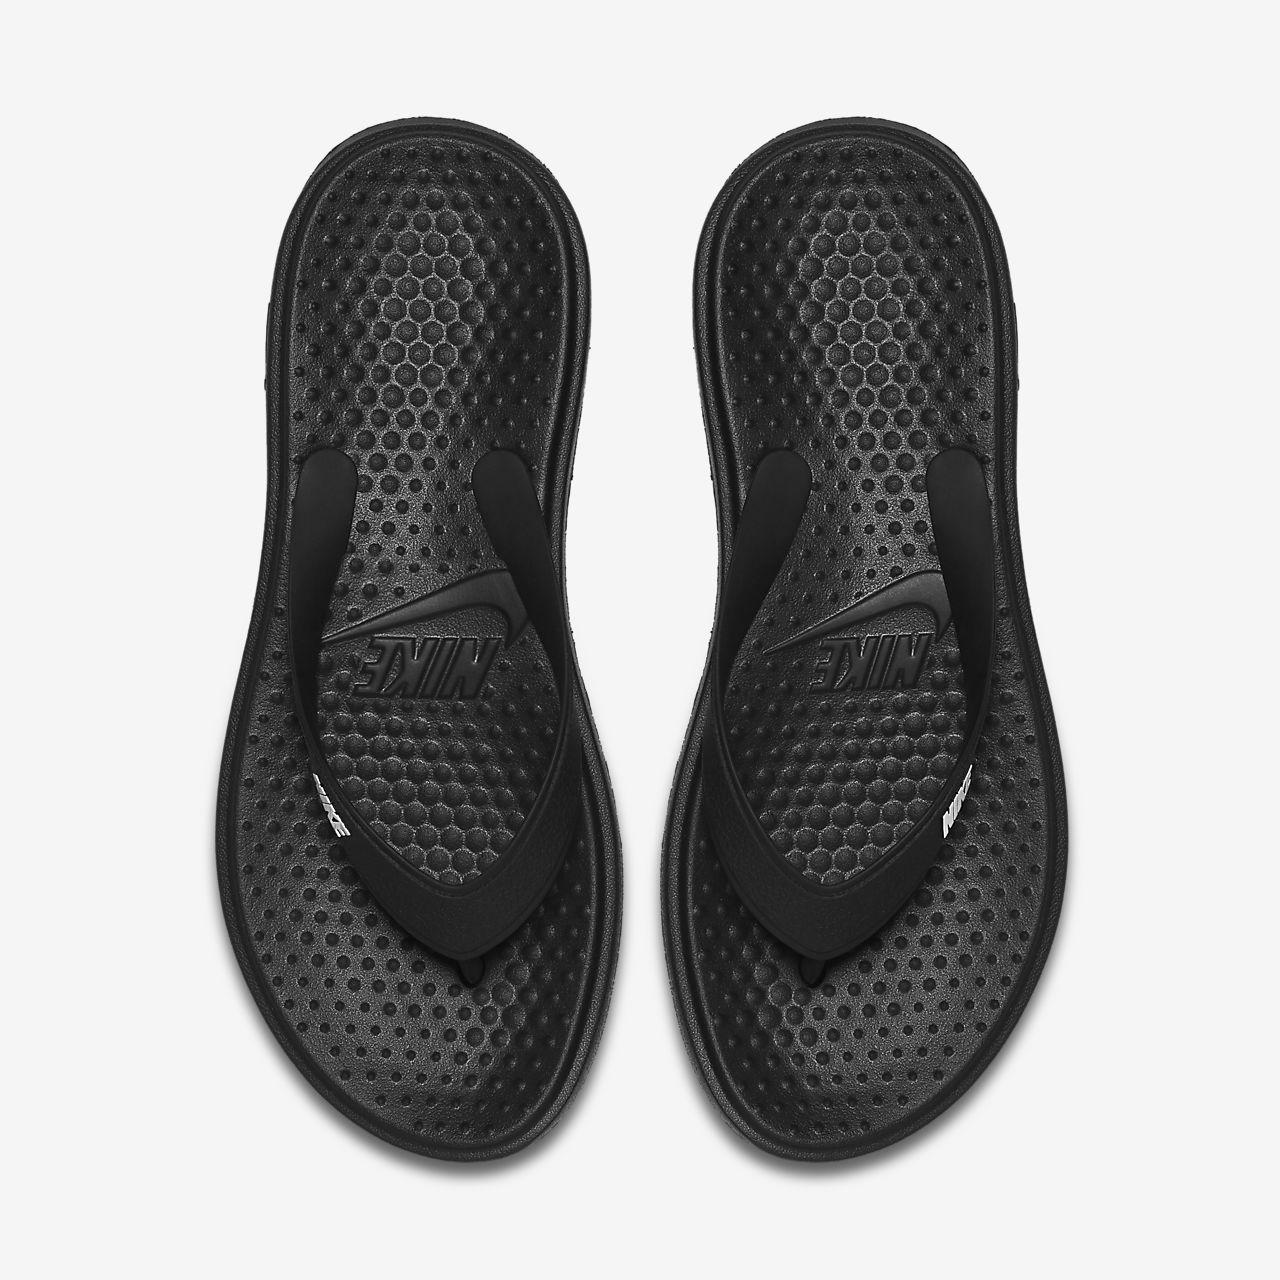 ... Nike Solay Men's Flip-Flop